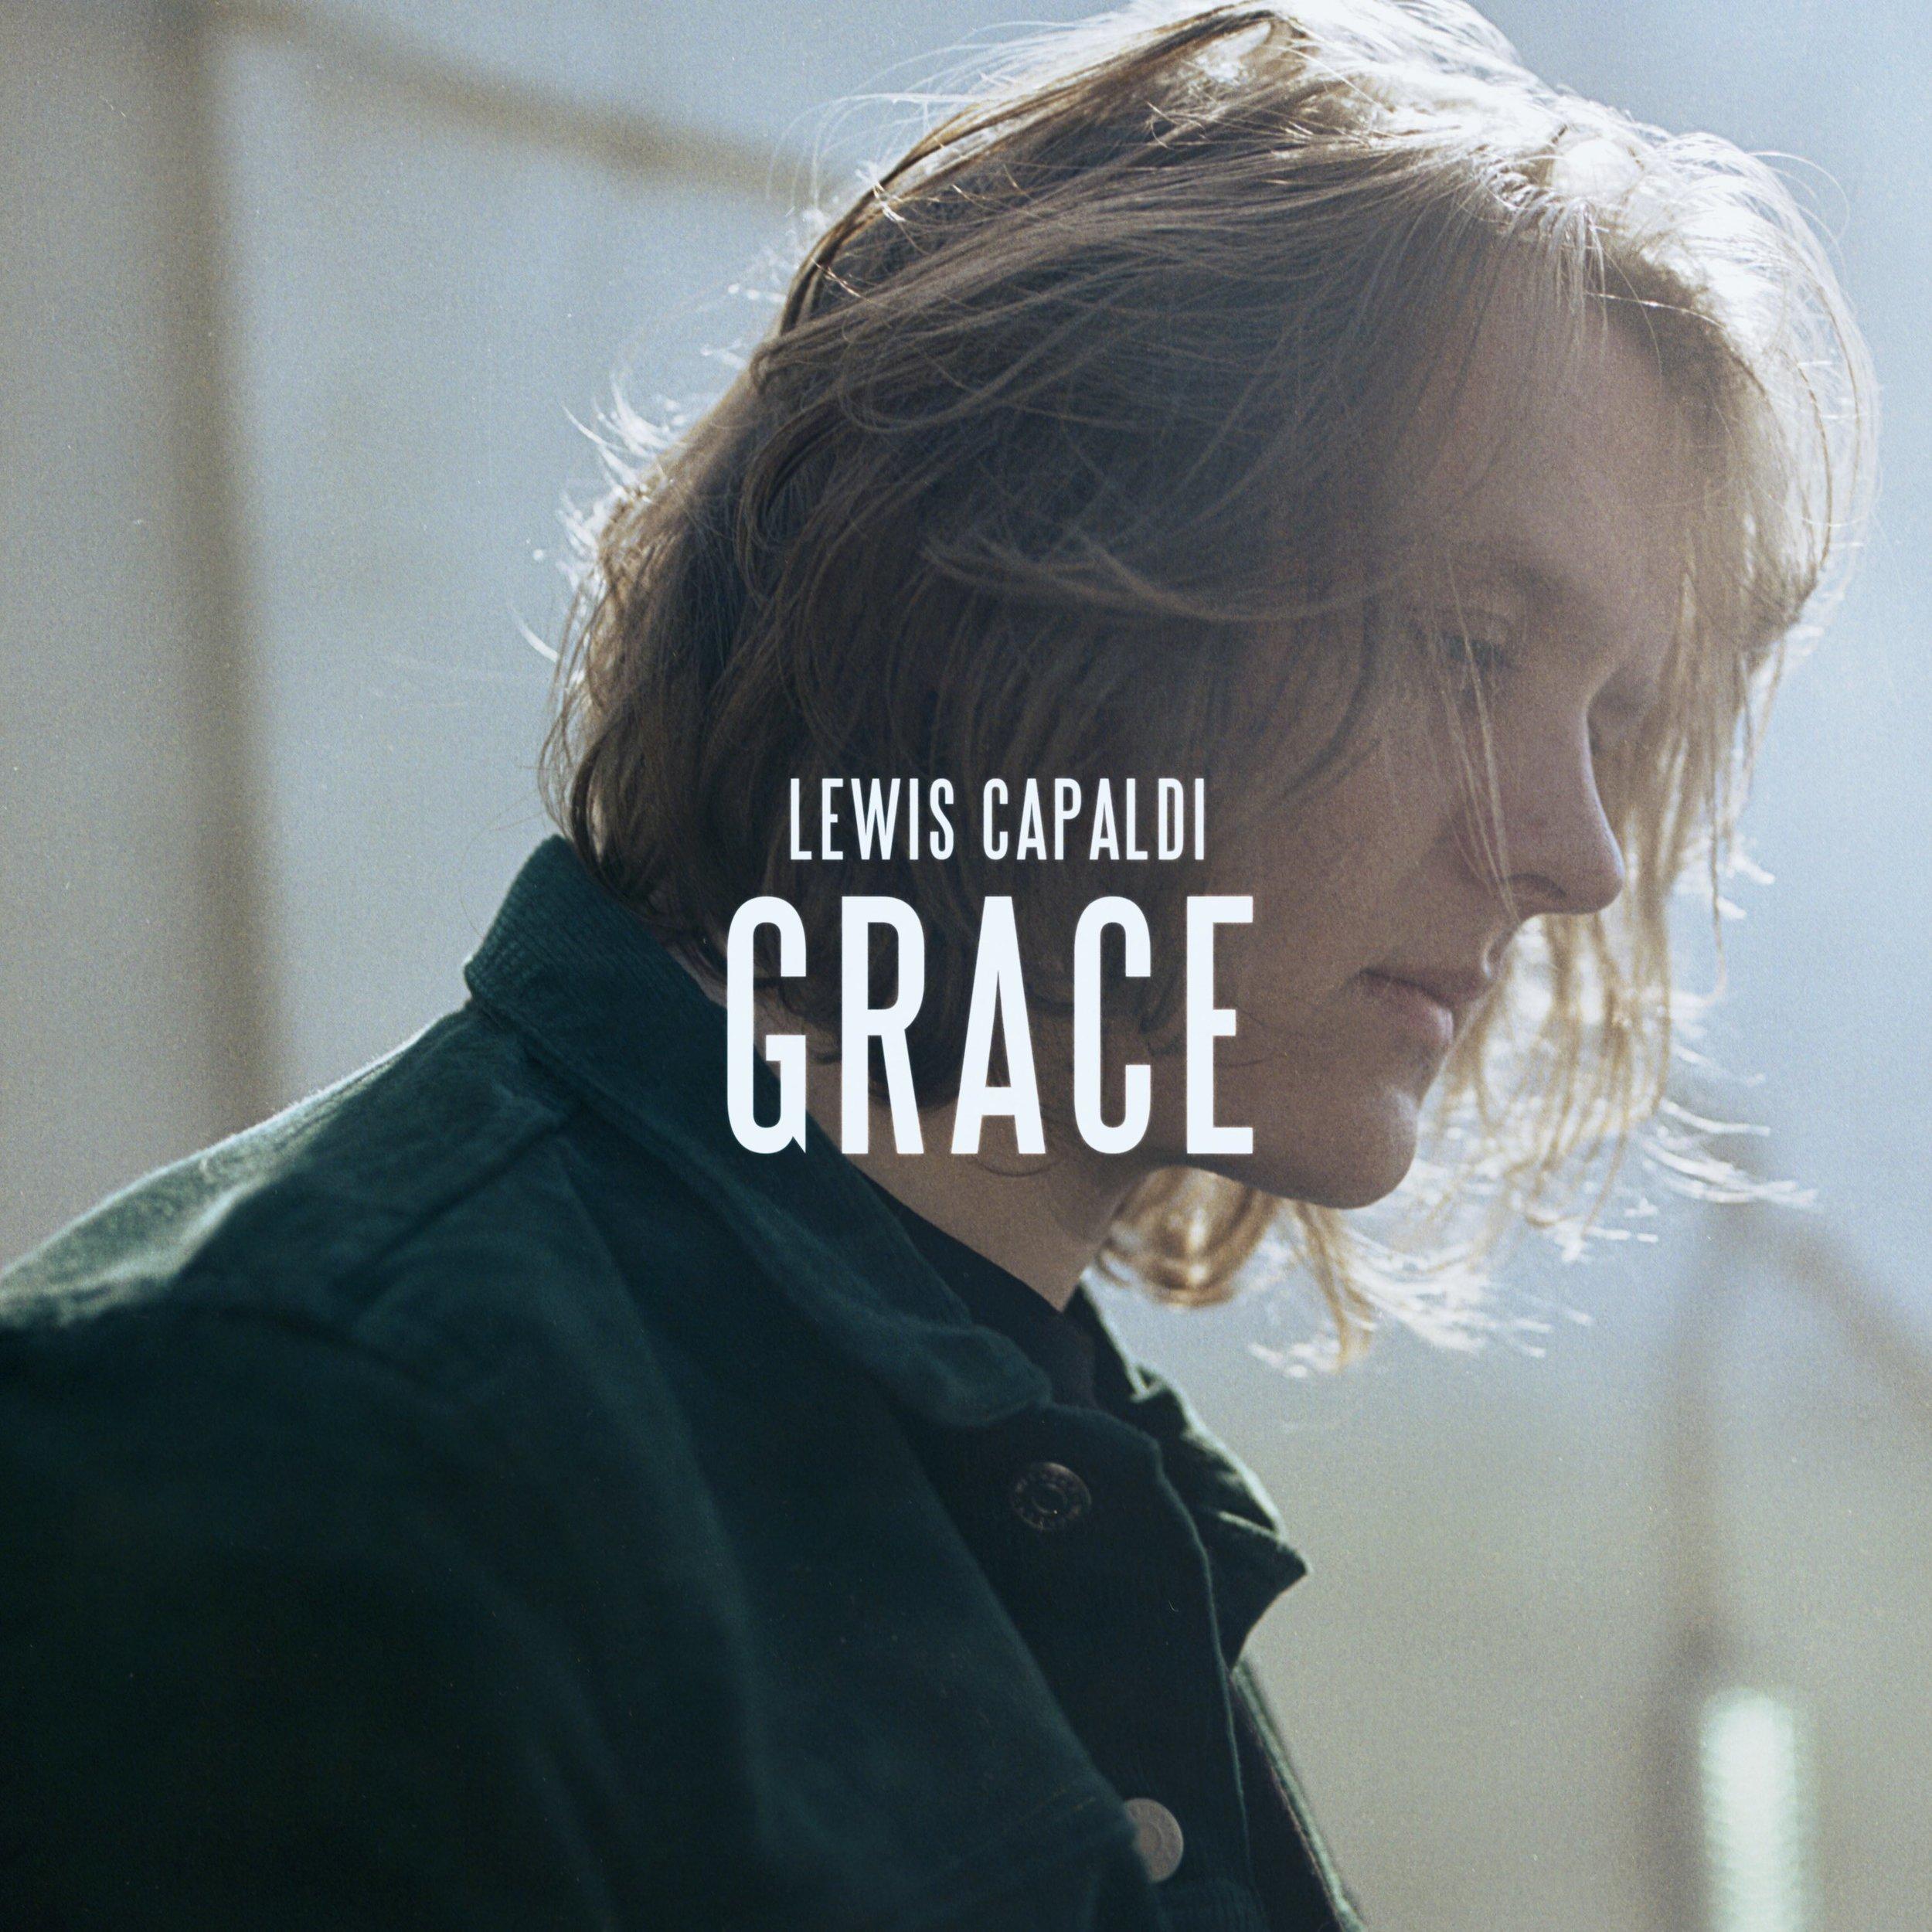 LewisCapaldi-Grace-3000x3000-copy.jpg